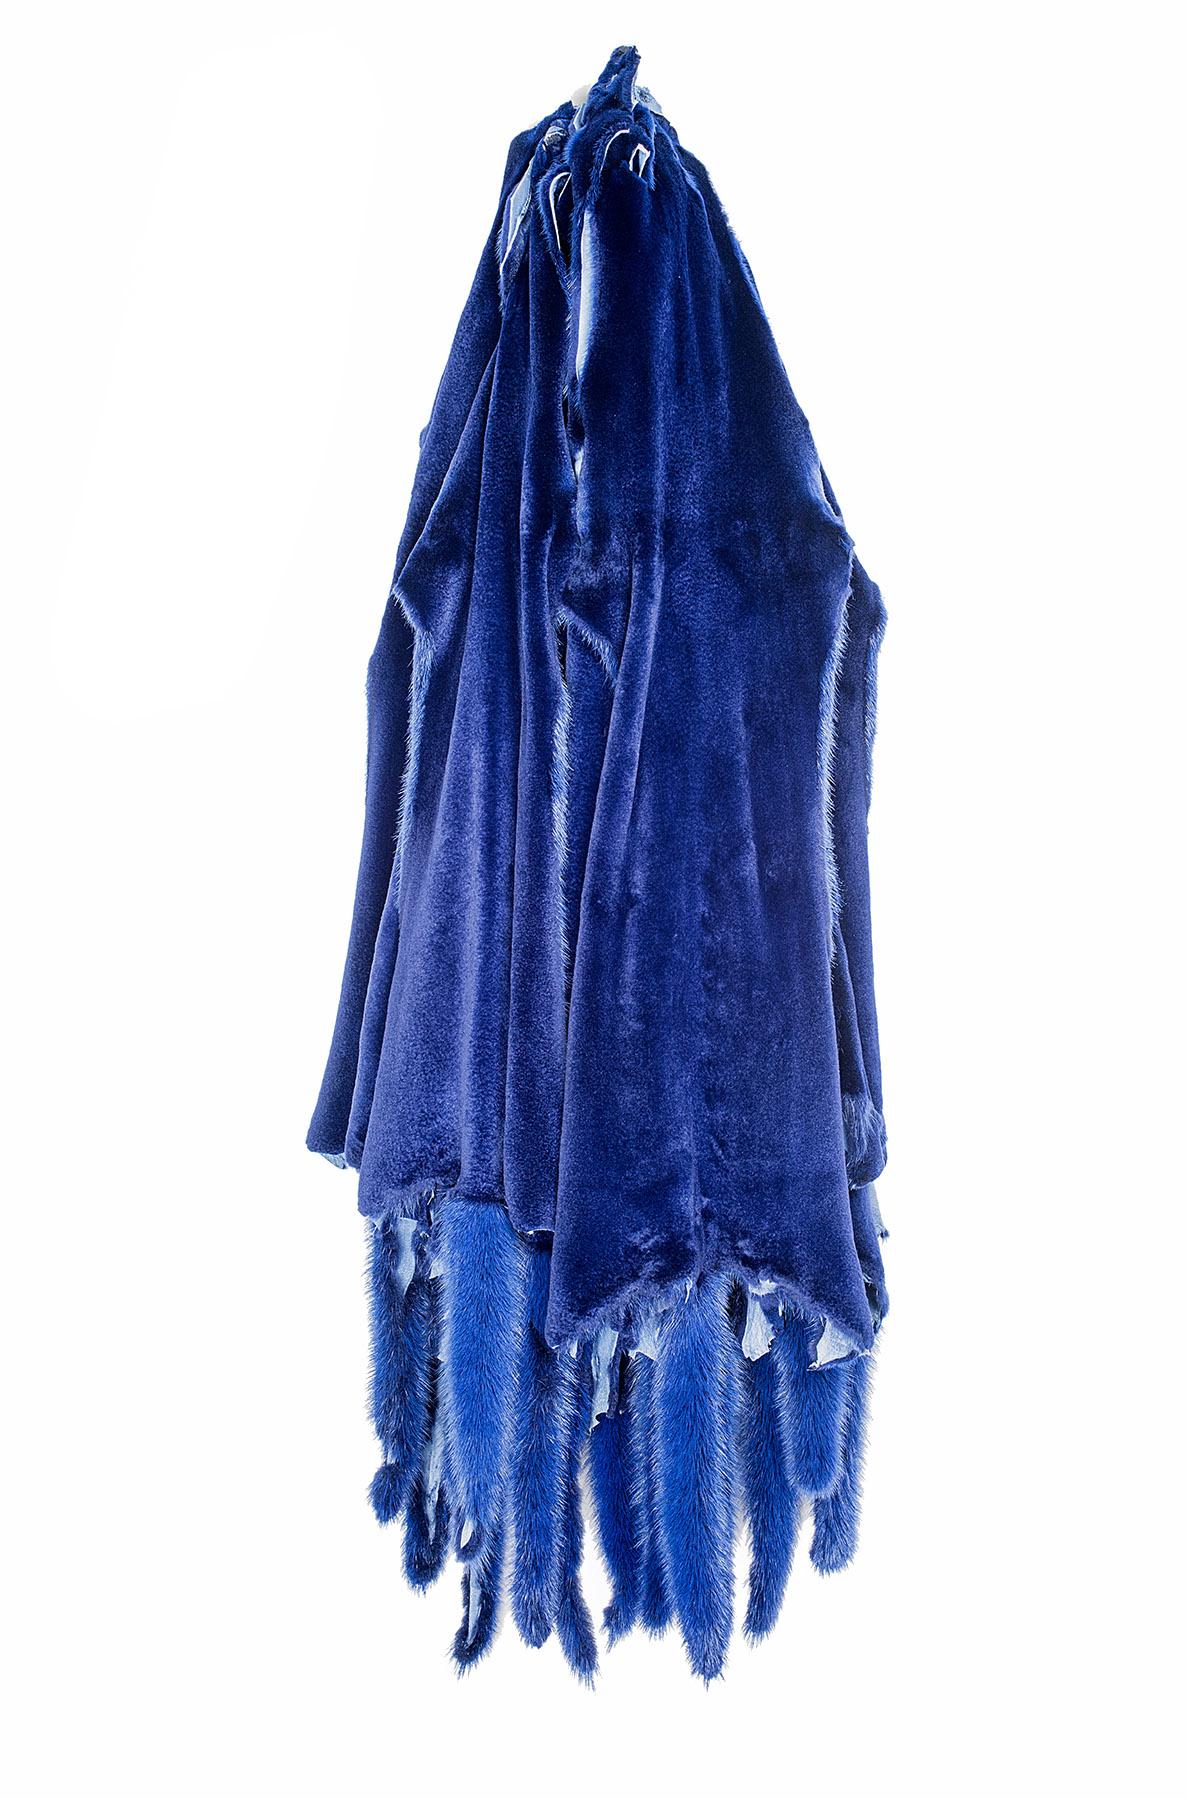 Норка Cиний вельвет щипаная (Blue Velvet Sheered)